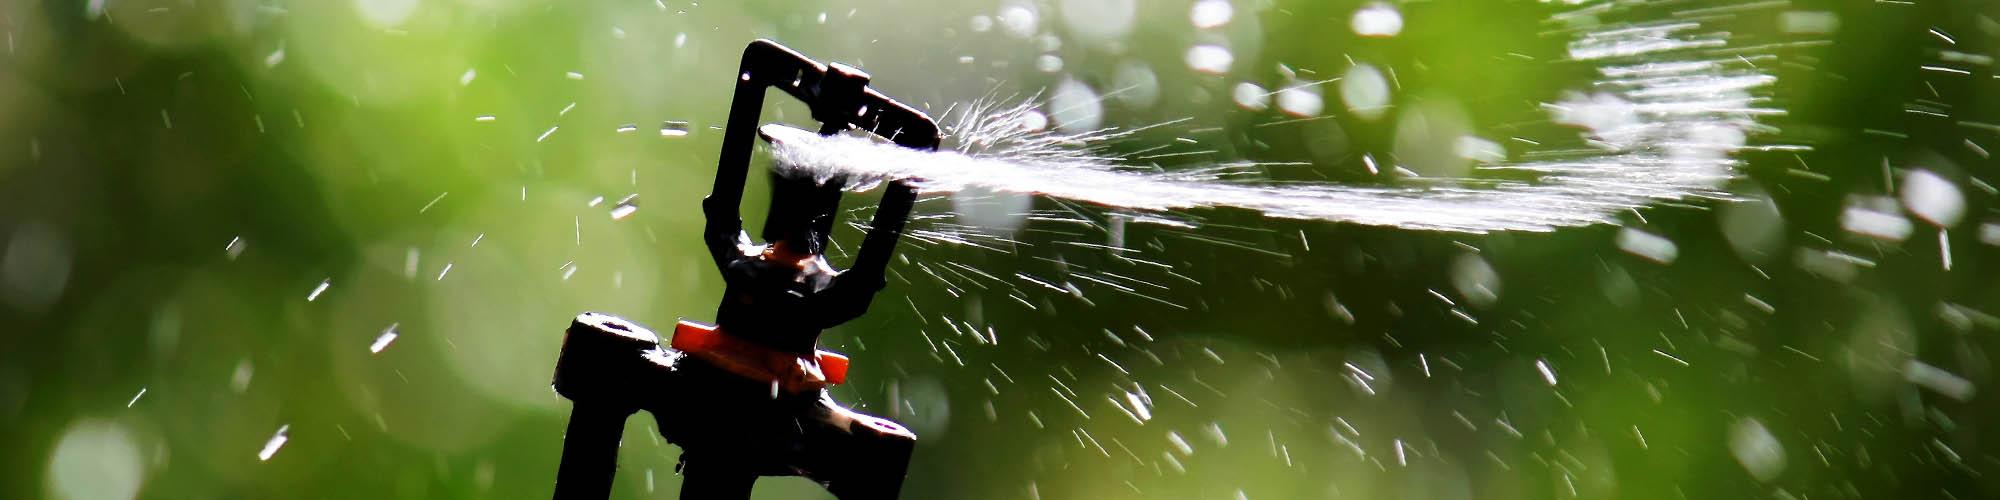 Impianti di irrigazione - Vendita online prodotti per l'irrigazione